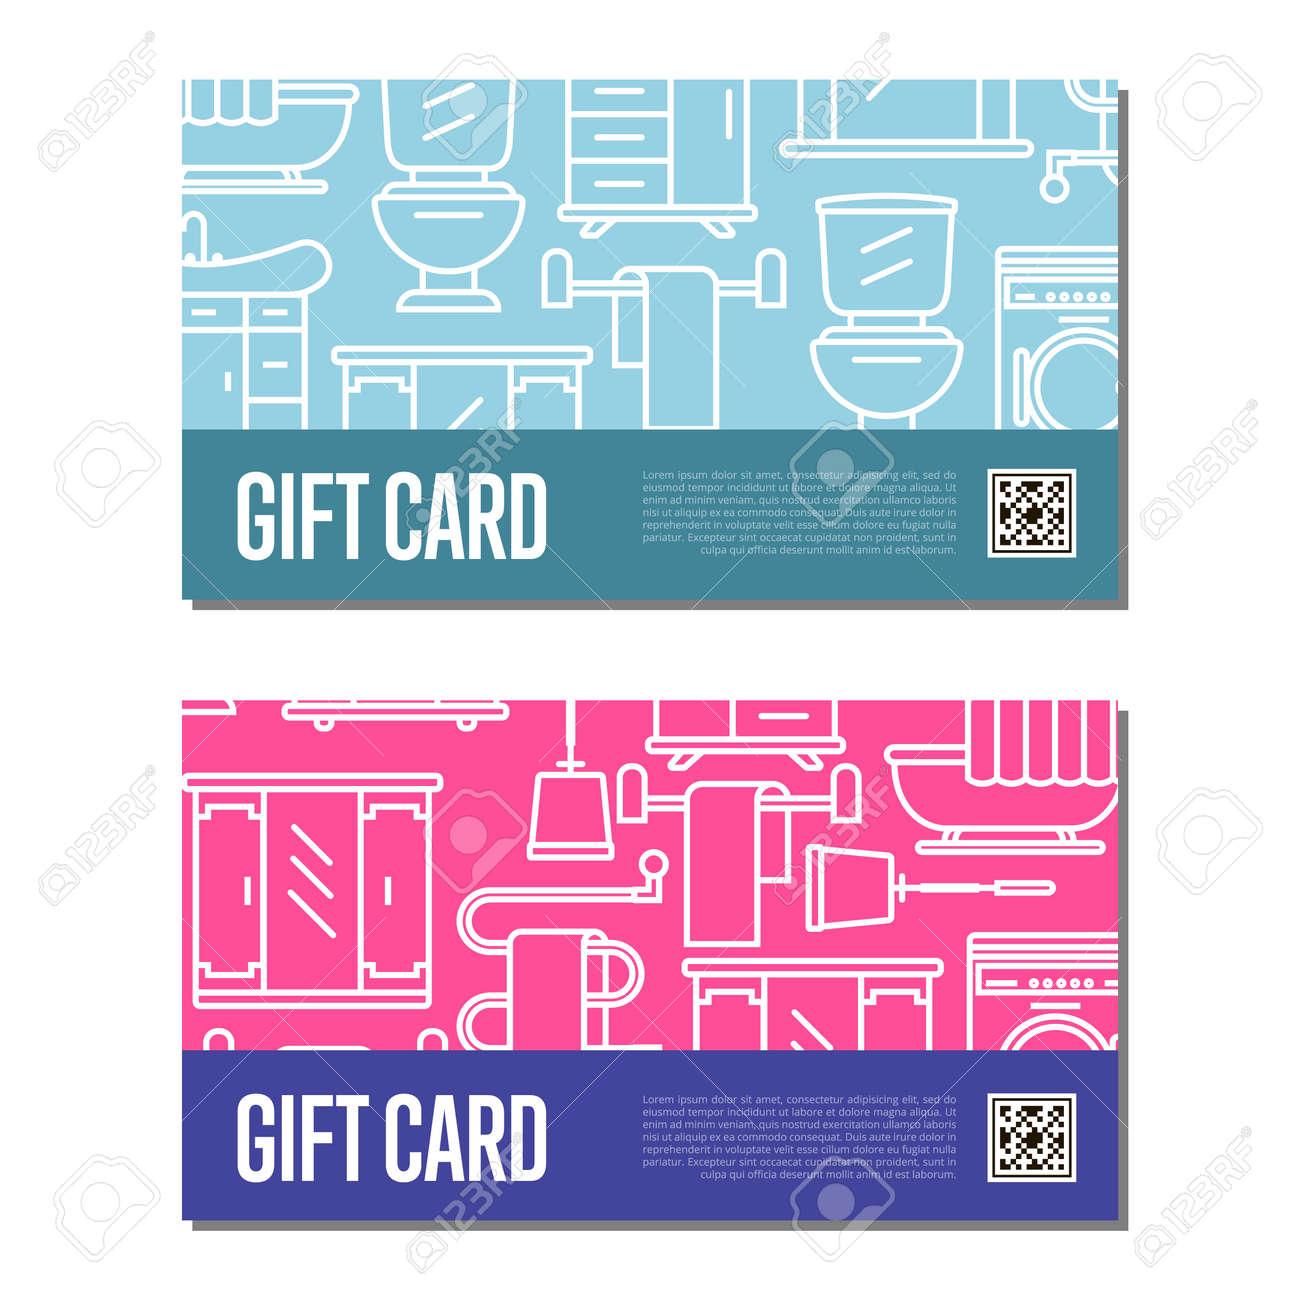 Gift Card For Bathroom Furniture Decor Home Interior Design